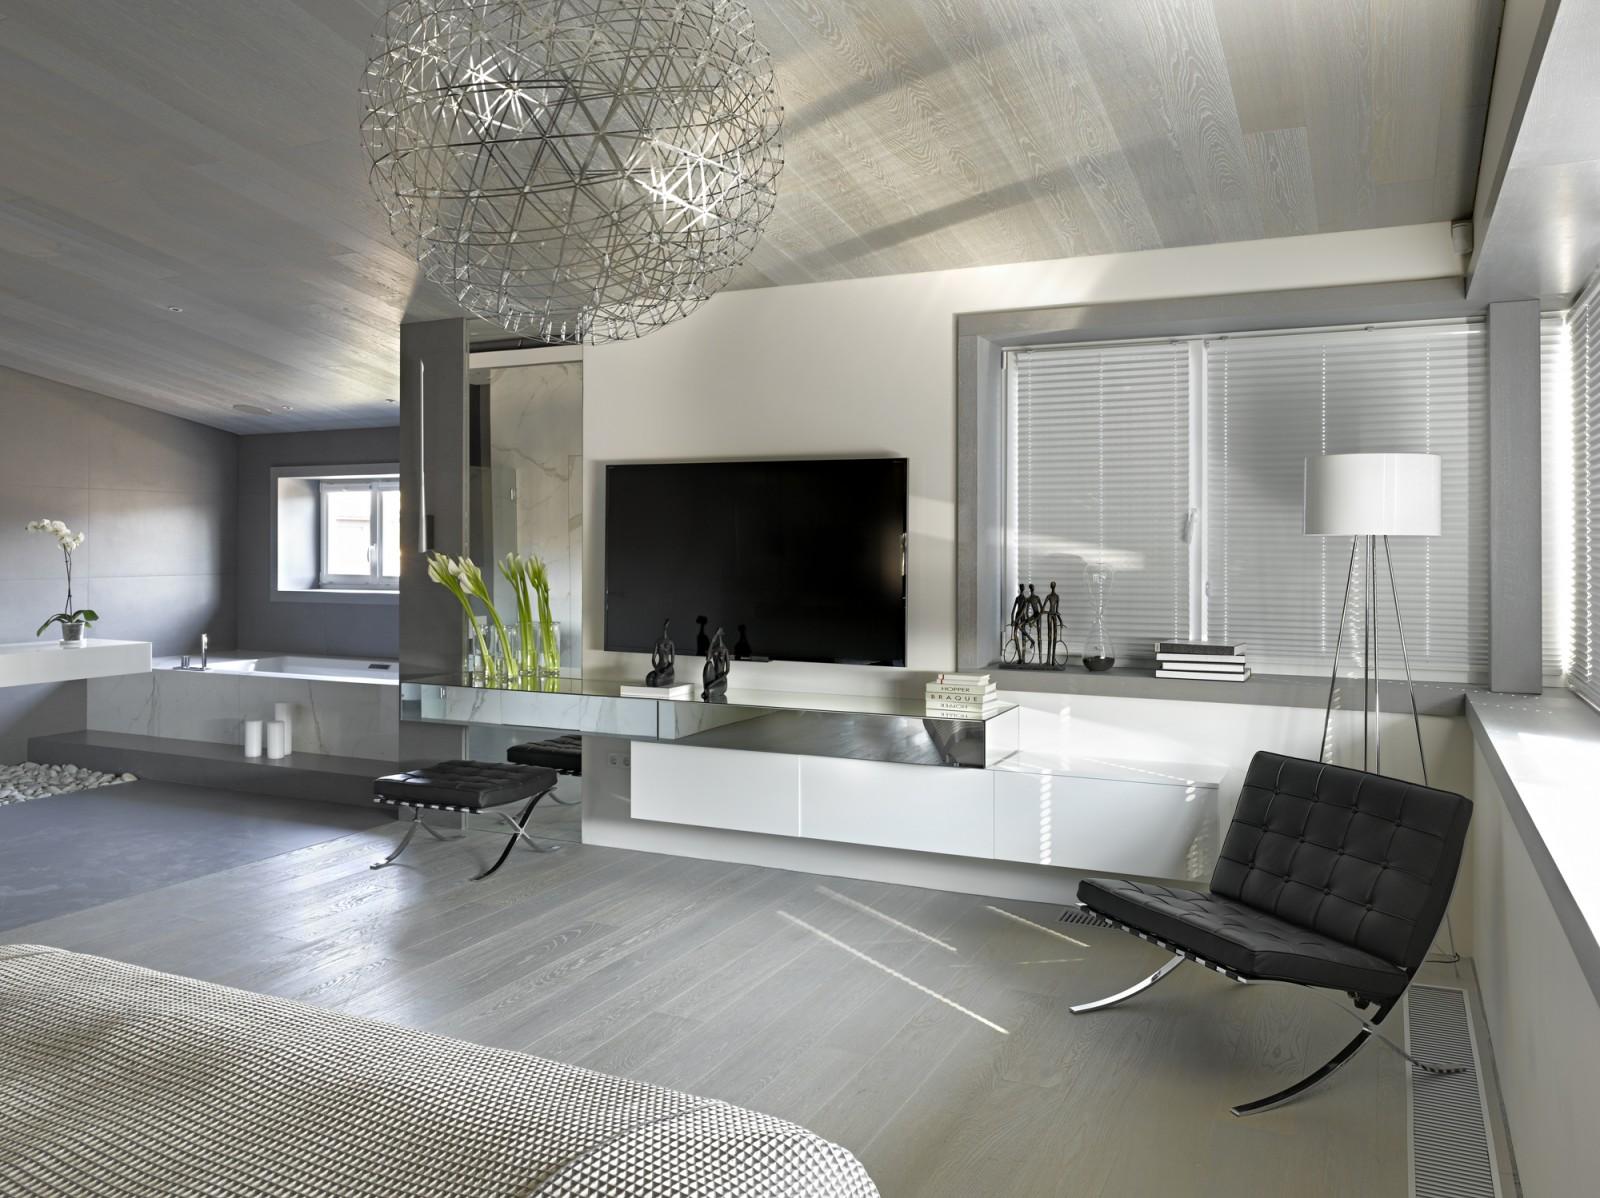 Nice villa interior by architectural Bureau of Alexandra Fedorova - 13